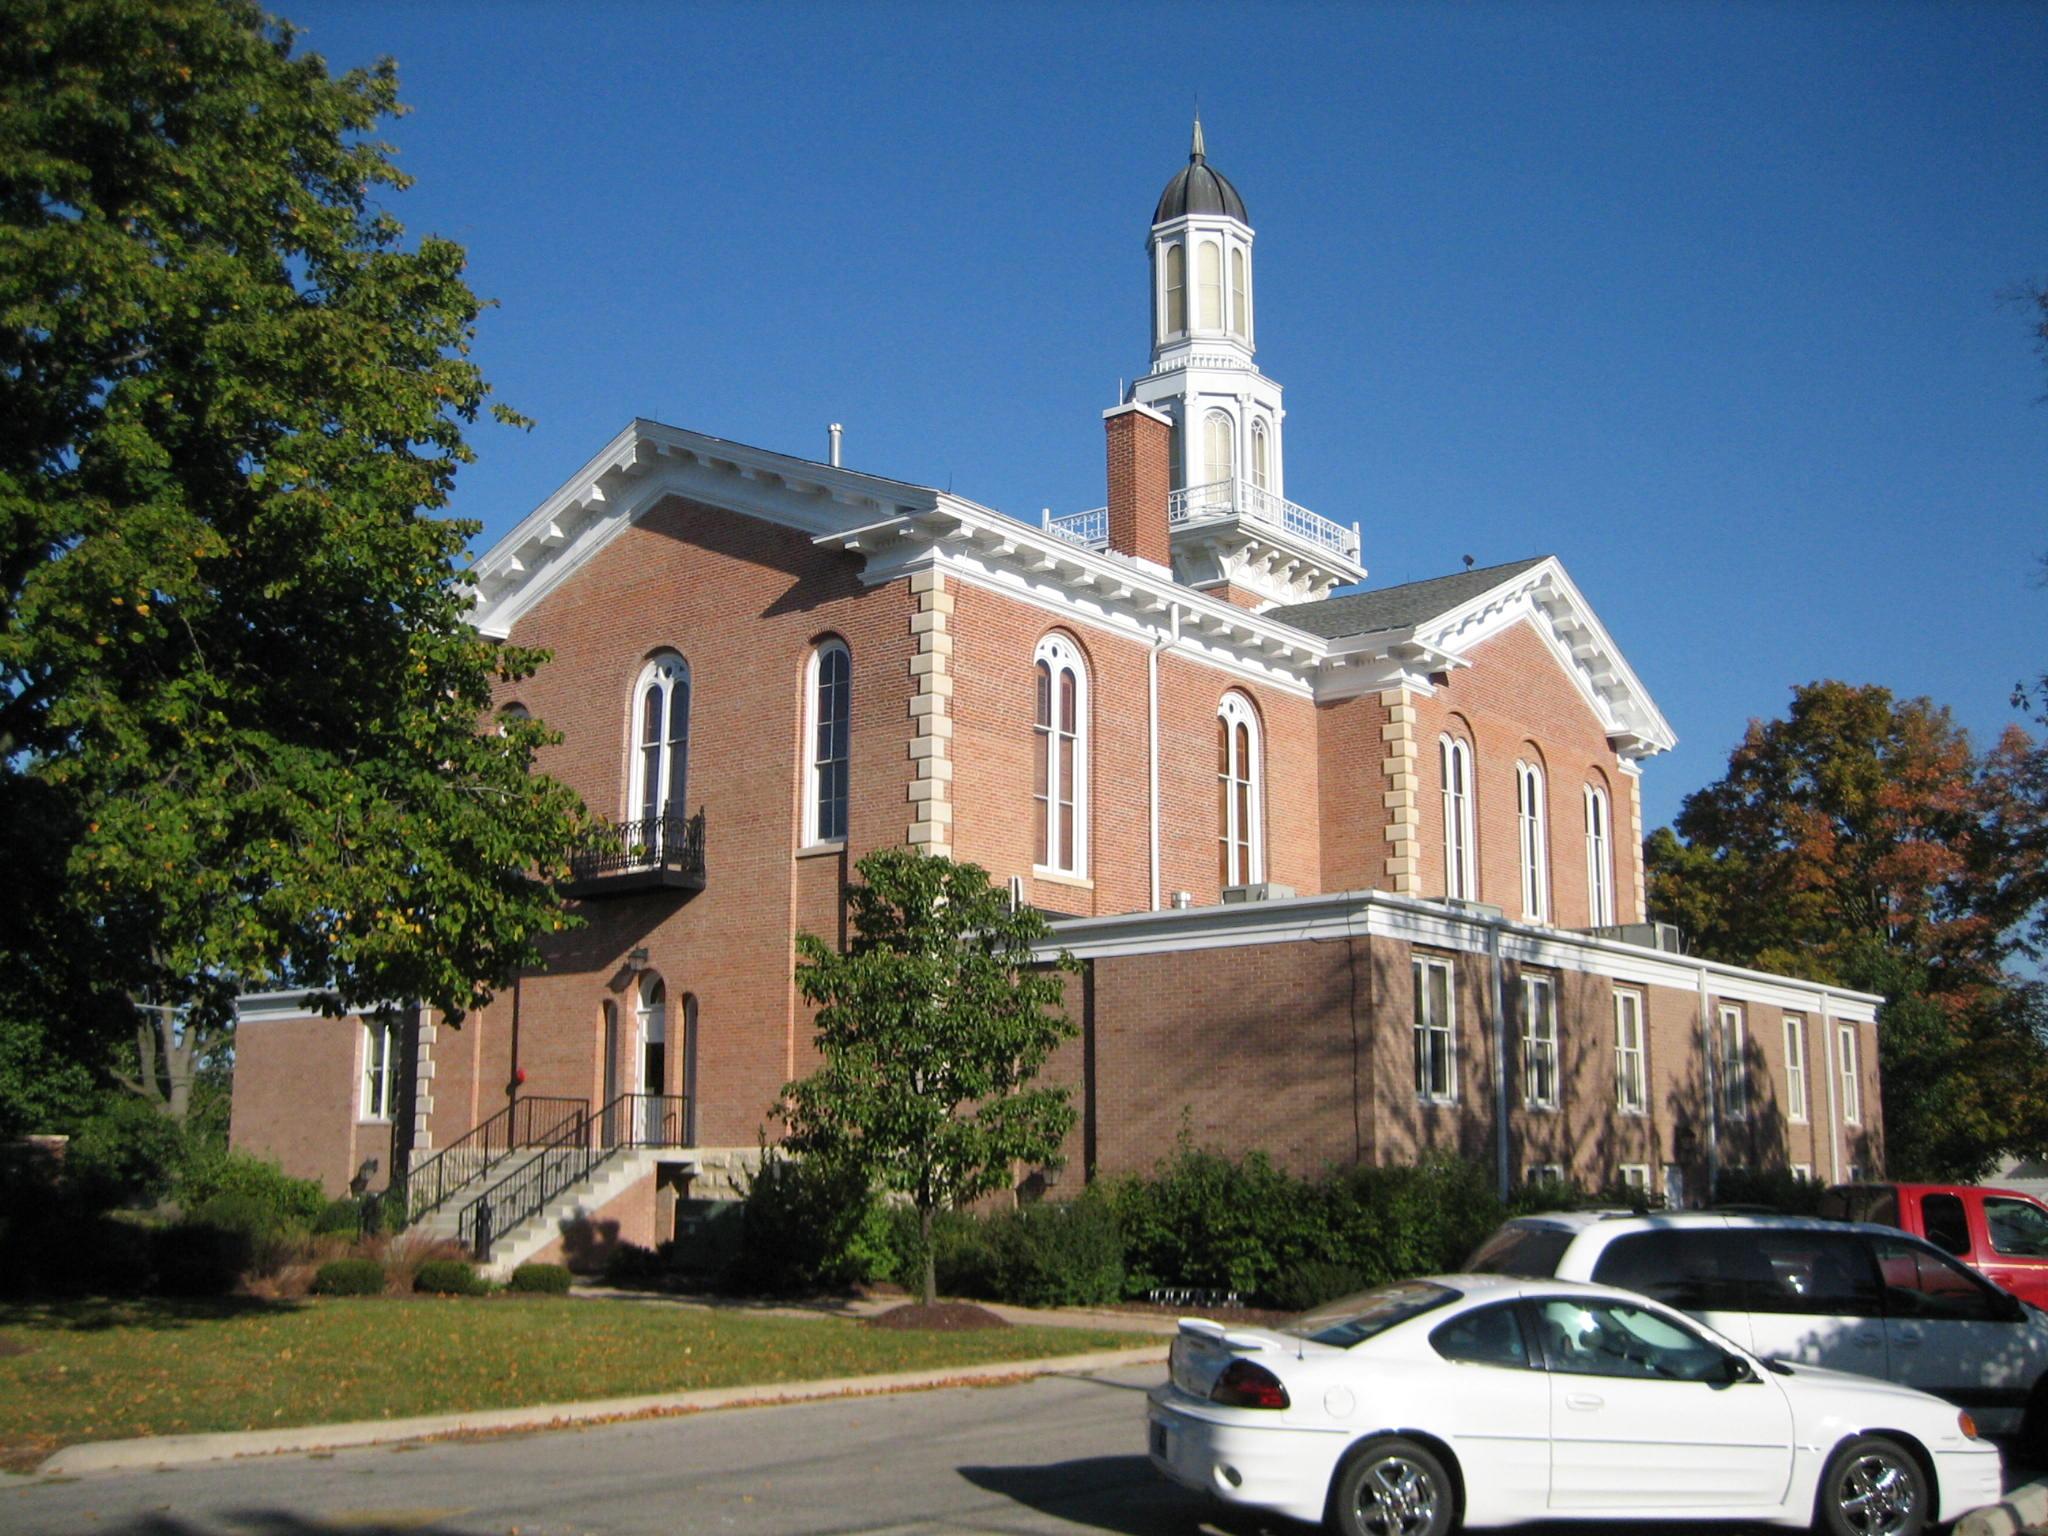 Illinois kendall county oswego - Illinois Kendall County Oswego 11